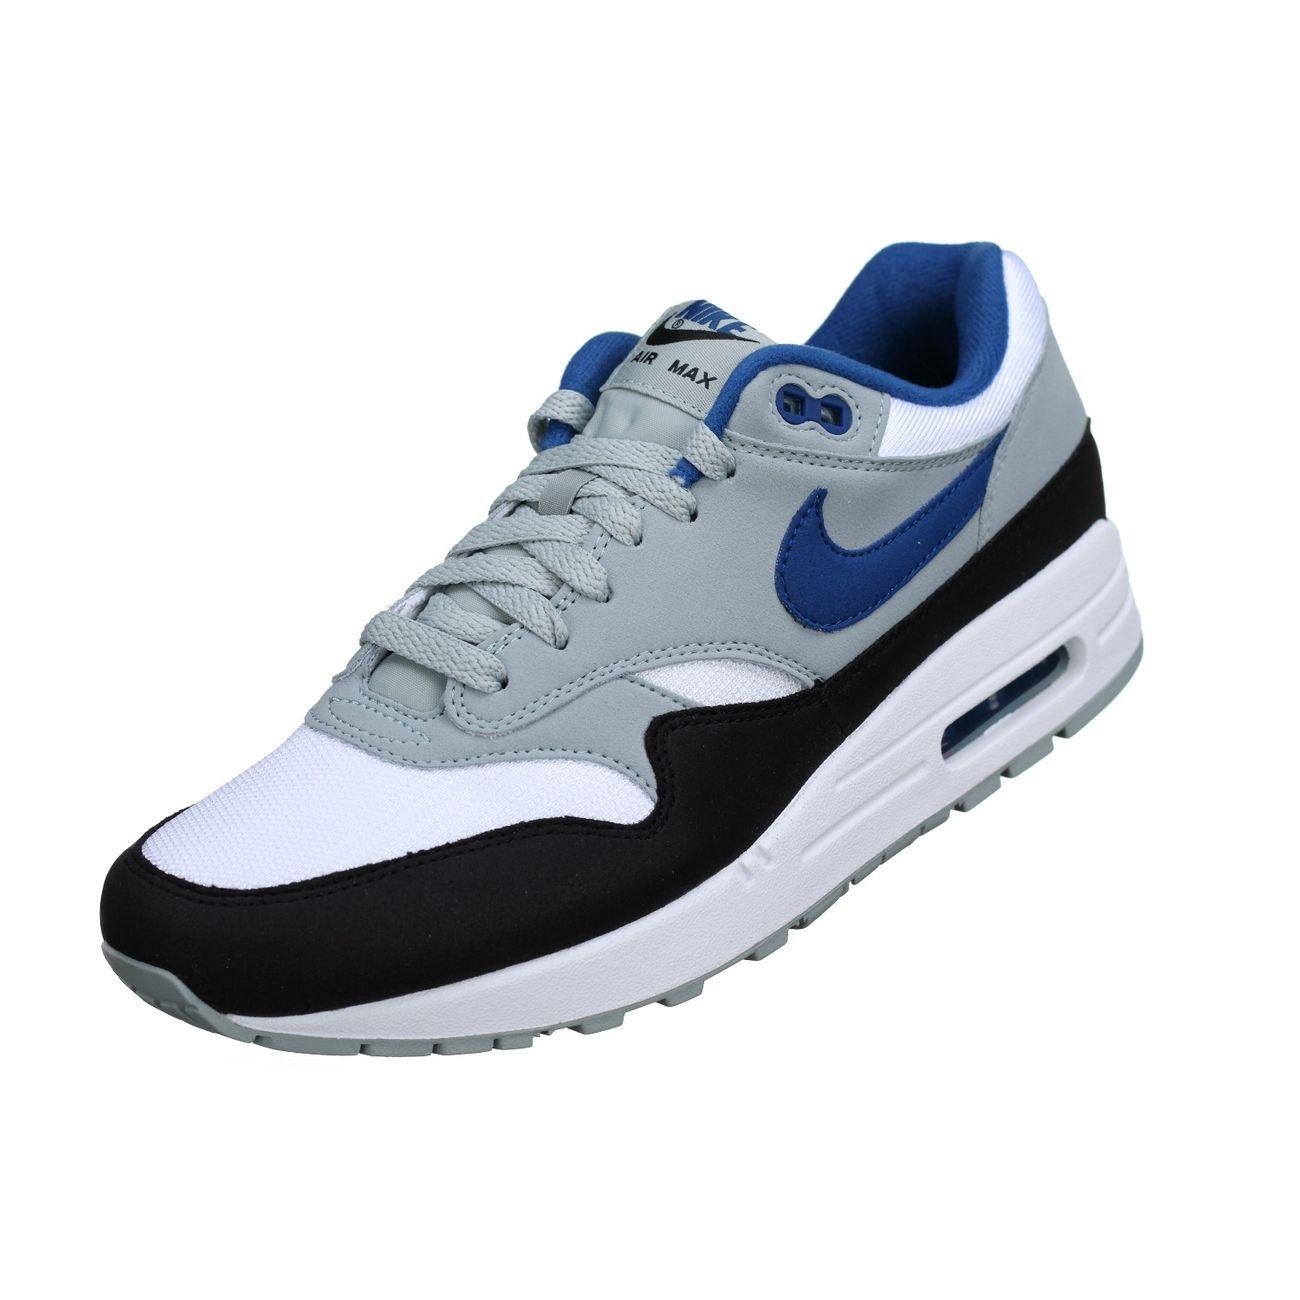 Mode- Lifestyle homme NIKE Basket Nike Air Max 1 Ah8145 - 102 Blanc / Bleu